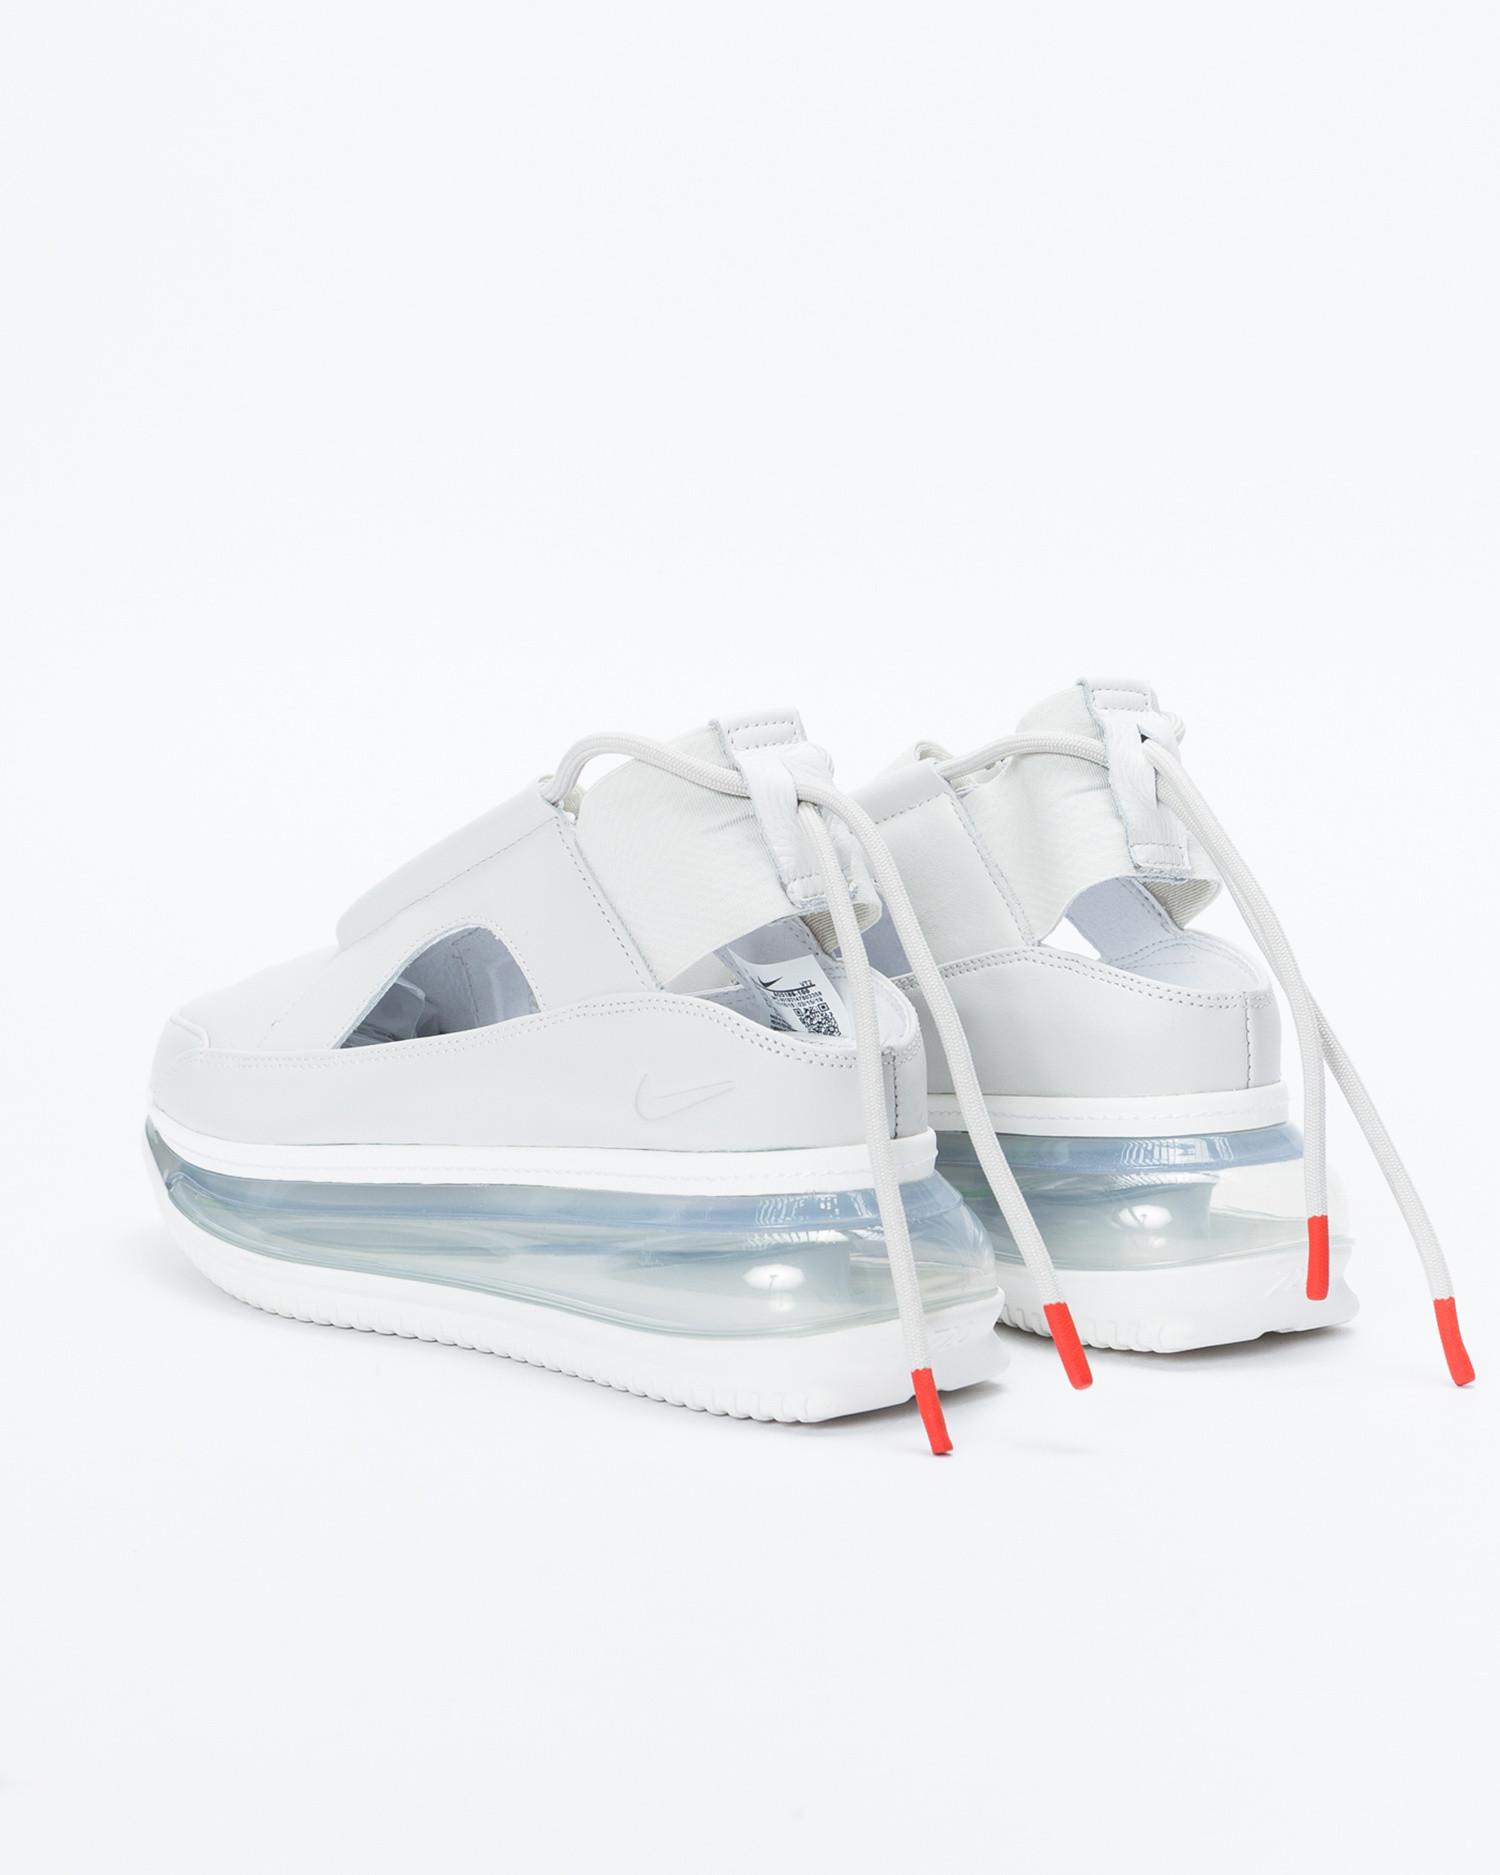 Nike Womens Air Max ff 720 Summit white/summit white-light bone